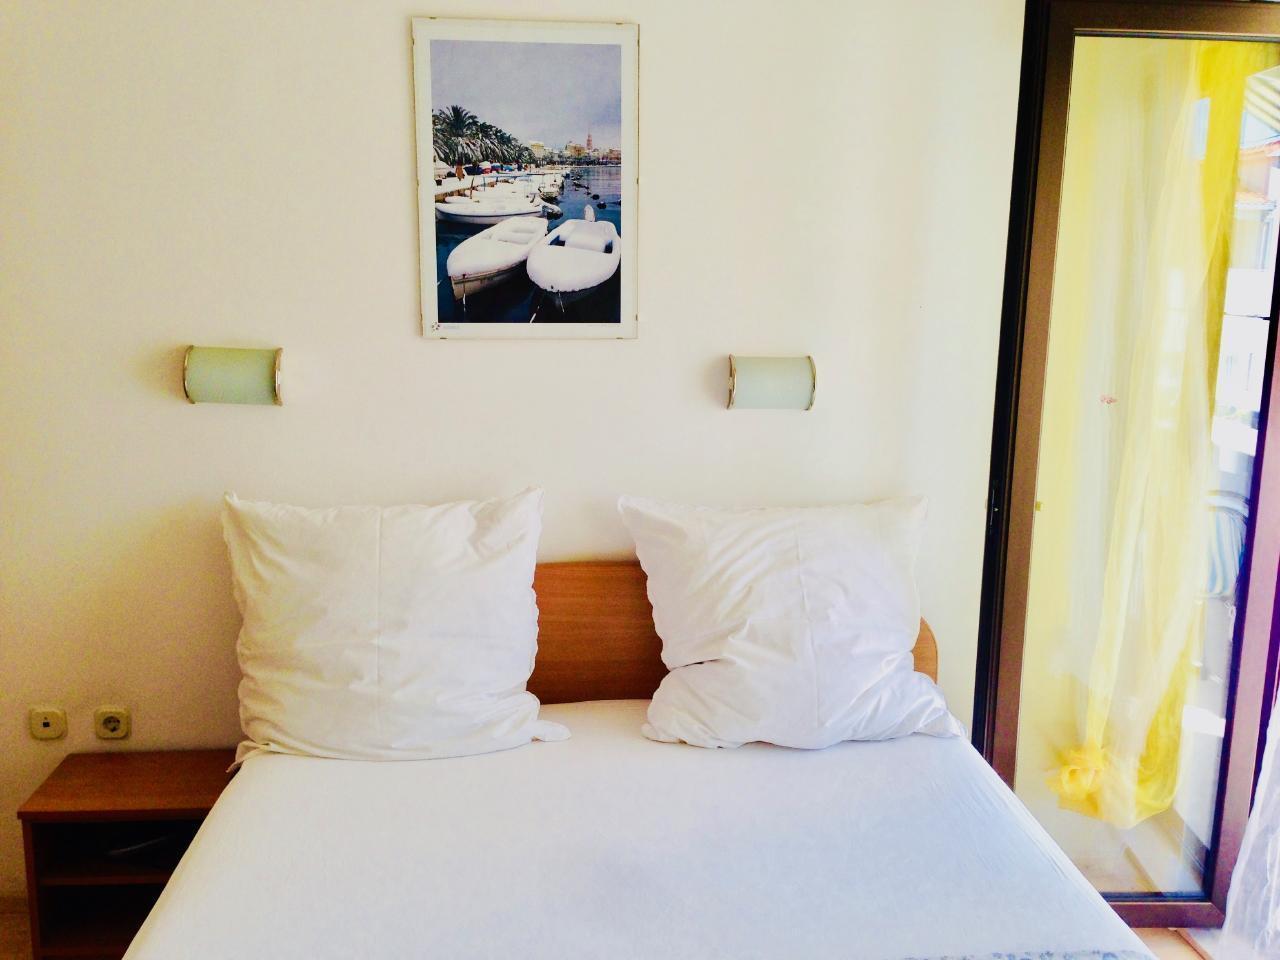 Ferienwohnung Apartmenthaus Ruza 6 - Apartment (98382), Kaštel Štafilić, , Dalmatien, Kroatien, Bild 4